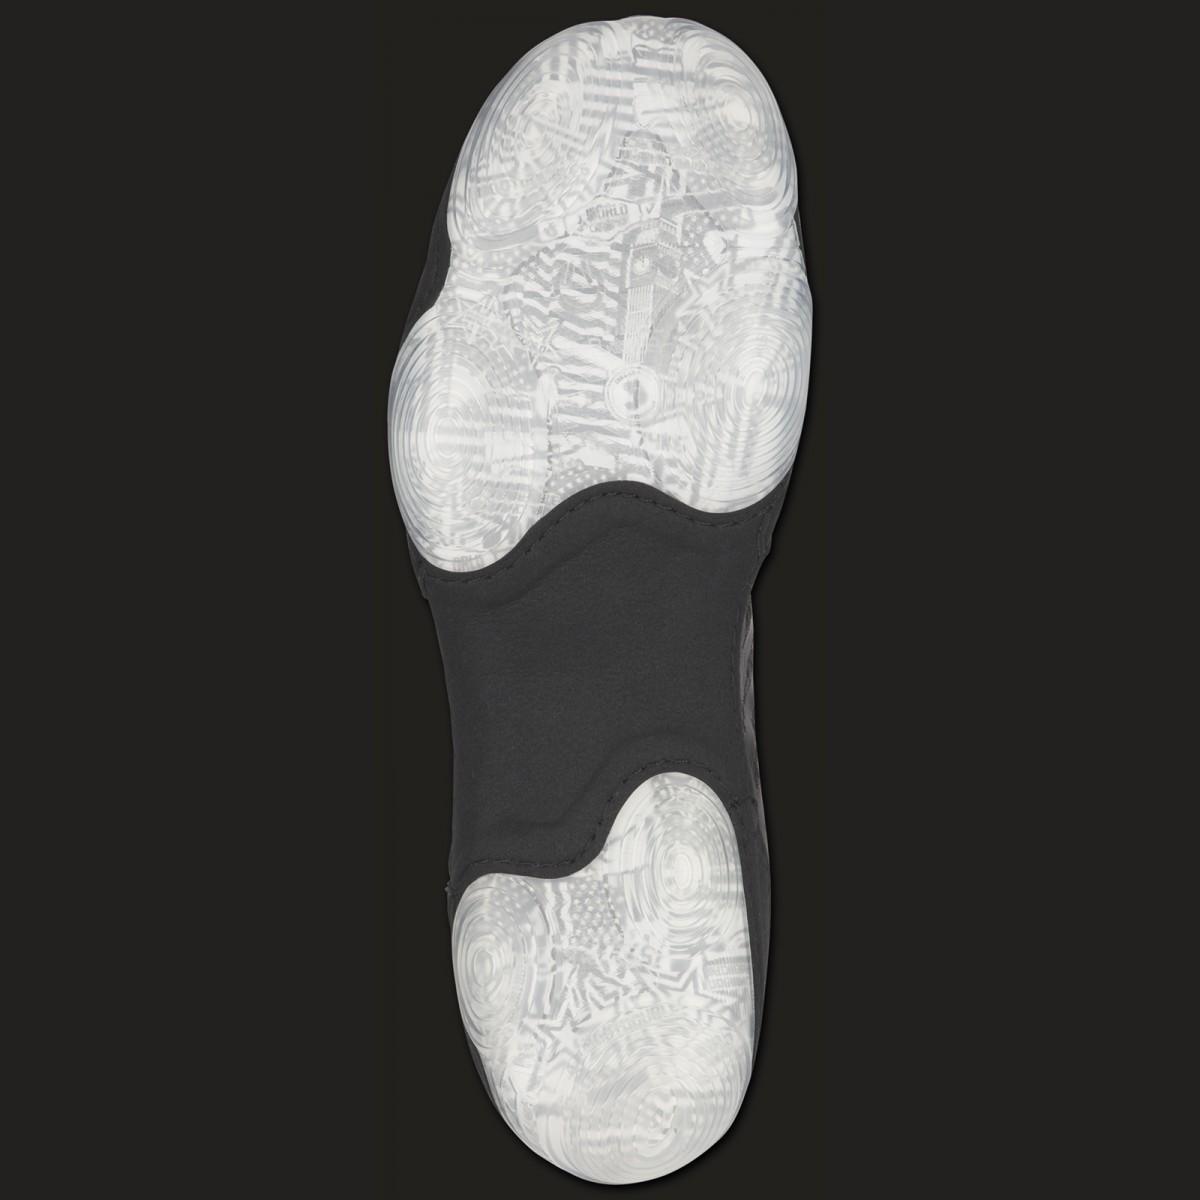 afd1695f579 ASICS JB Elite III boxing and wrestling shoe Black white